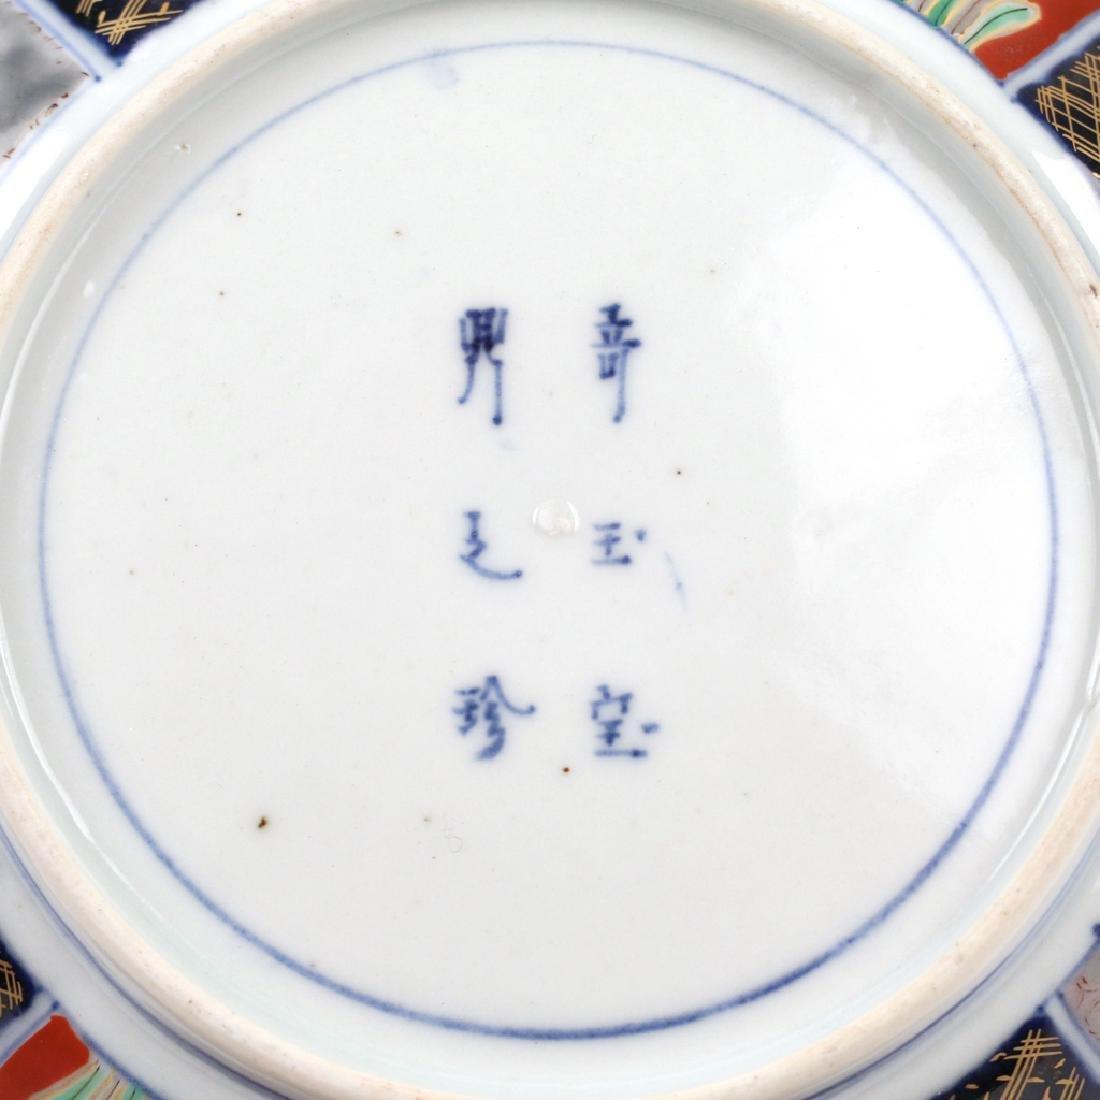 (11pc) ANTIQUE JAPANESE PORCELAIN DISHES - 7